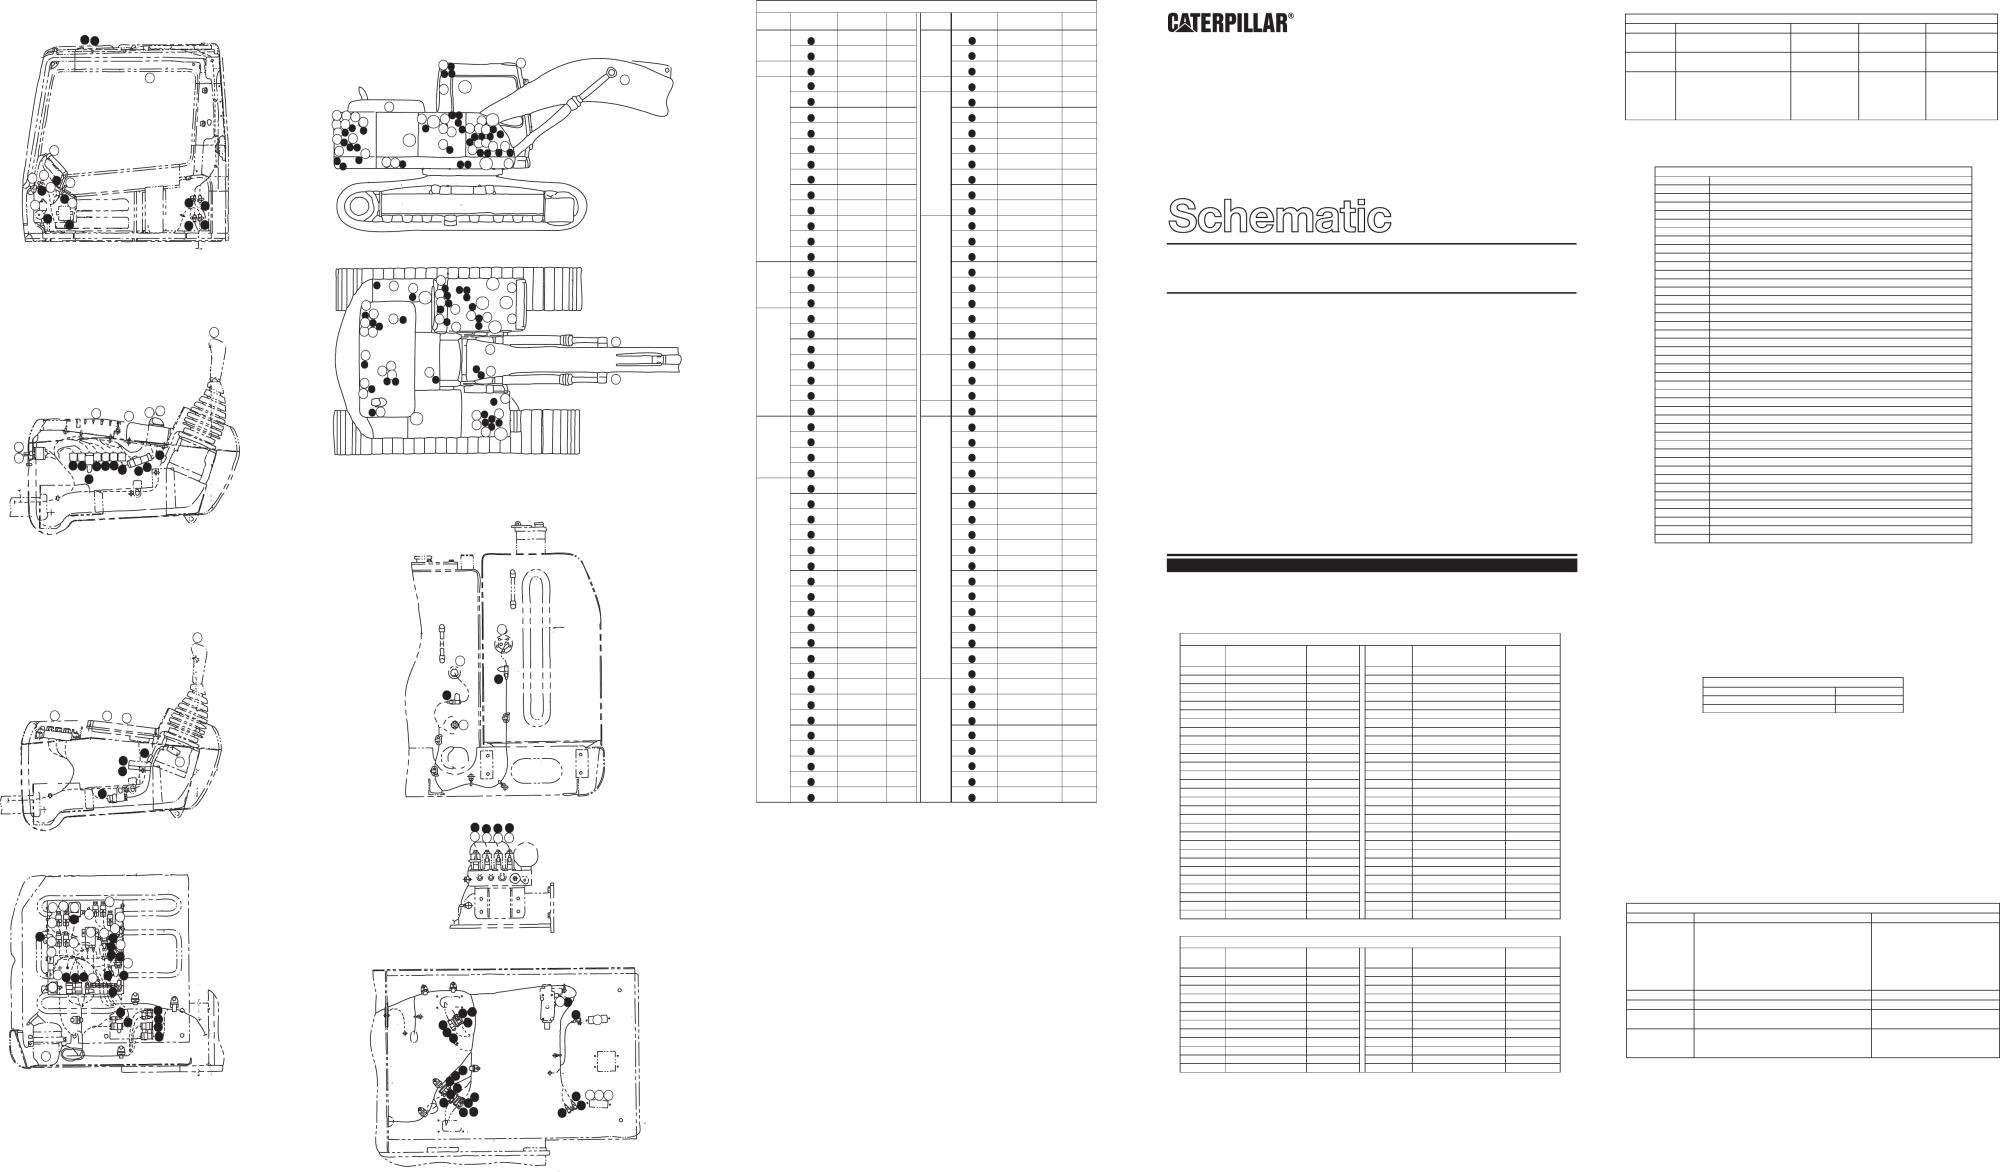 hight resolution of 320b u excavator electrical schematic akashi used in service manual senr9240 2000 caterpillar